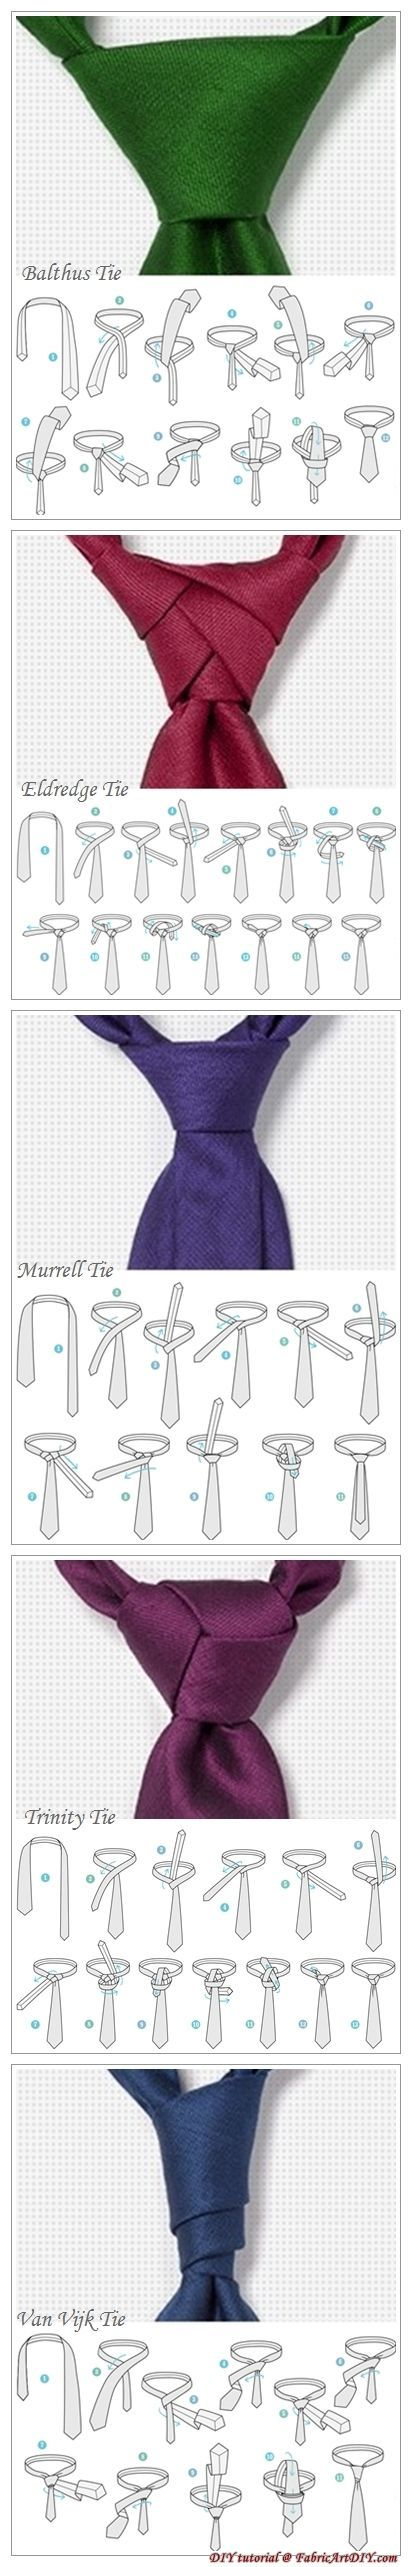 krawattenknoten alex pin pinterest krawatte. Black Bedroom Furniture Sets. Home Design Ideas